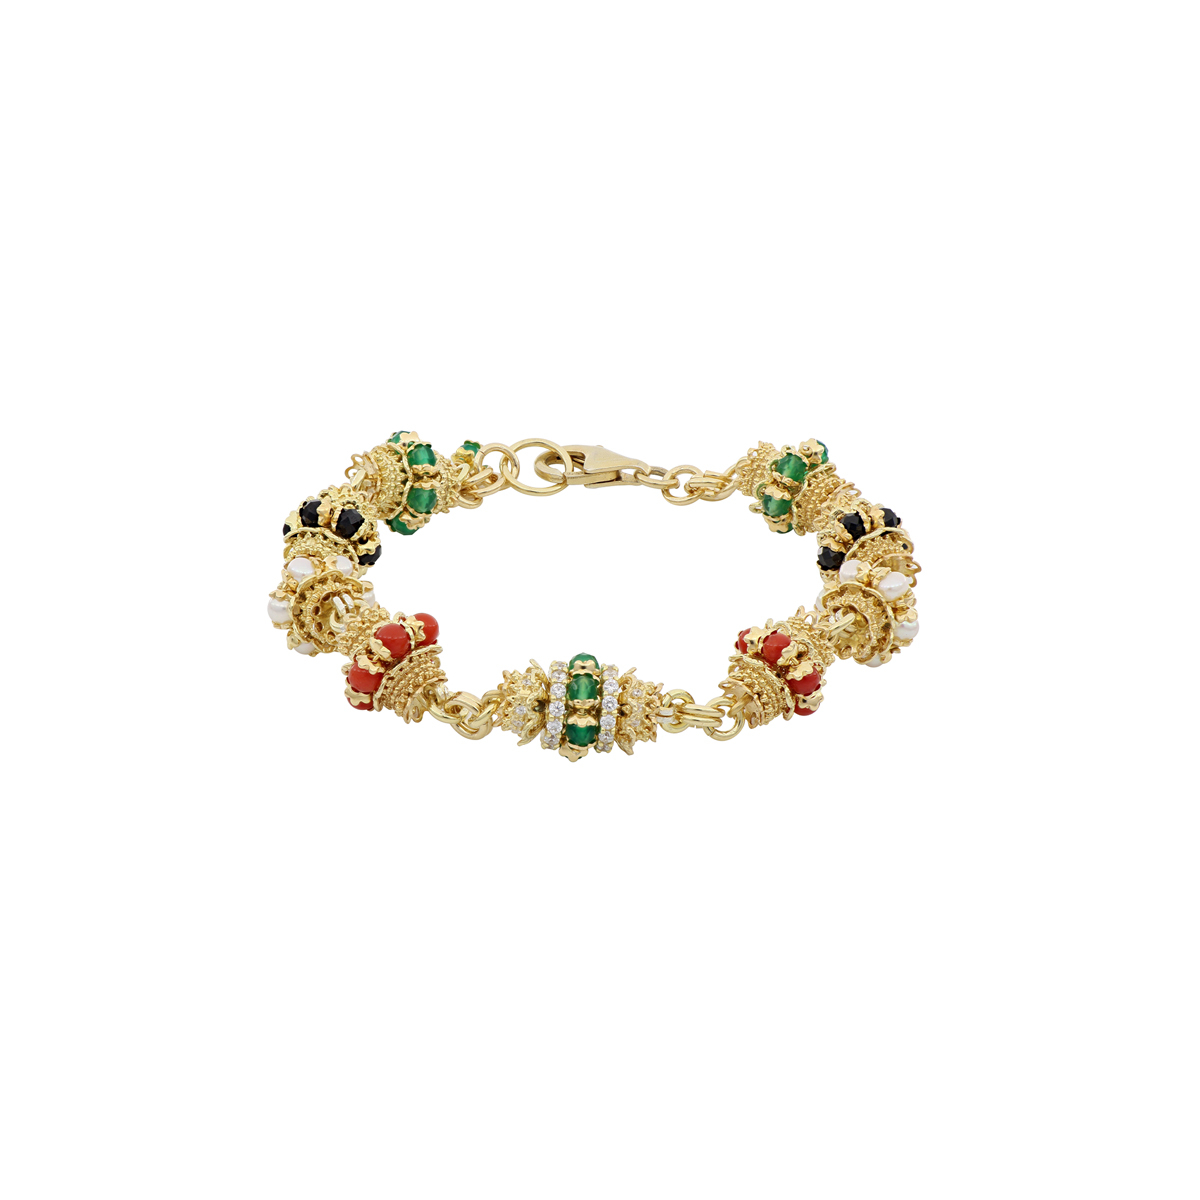 Multi-Gem Grapples Bracelet